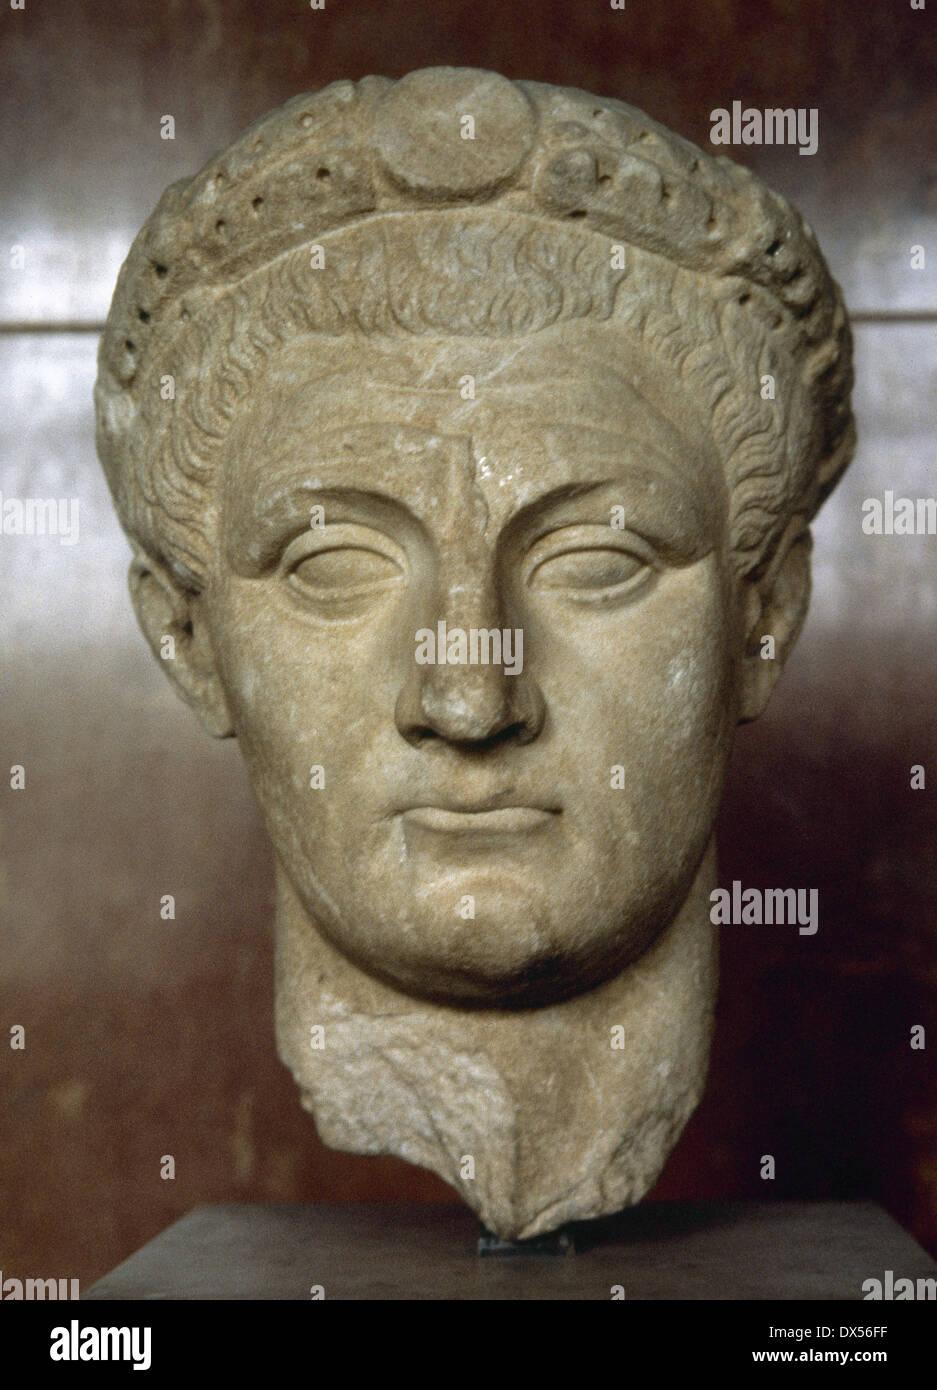 Claudius (10 BC-54 AD). Roman emperor. Julio-Claudia, dynasty. Idealized bust. Marble. From Thassos. Louvre Museum. Paris. - Stock Image